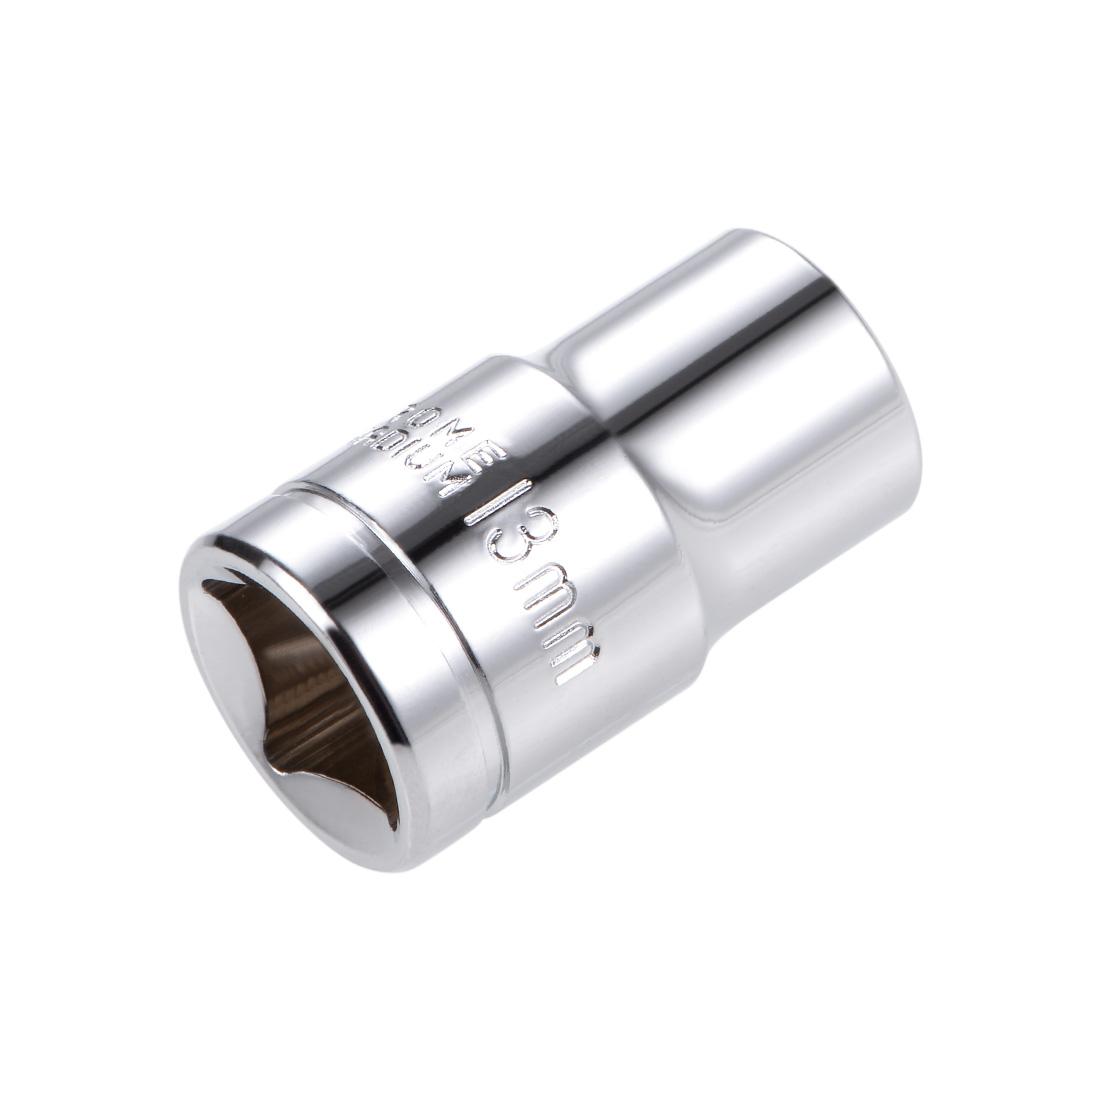 1/2-inch Drive E13 Universal Spline Socket Shallow 12 Point Cr-V Steel